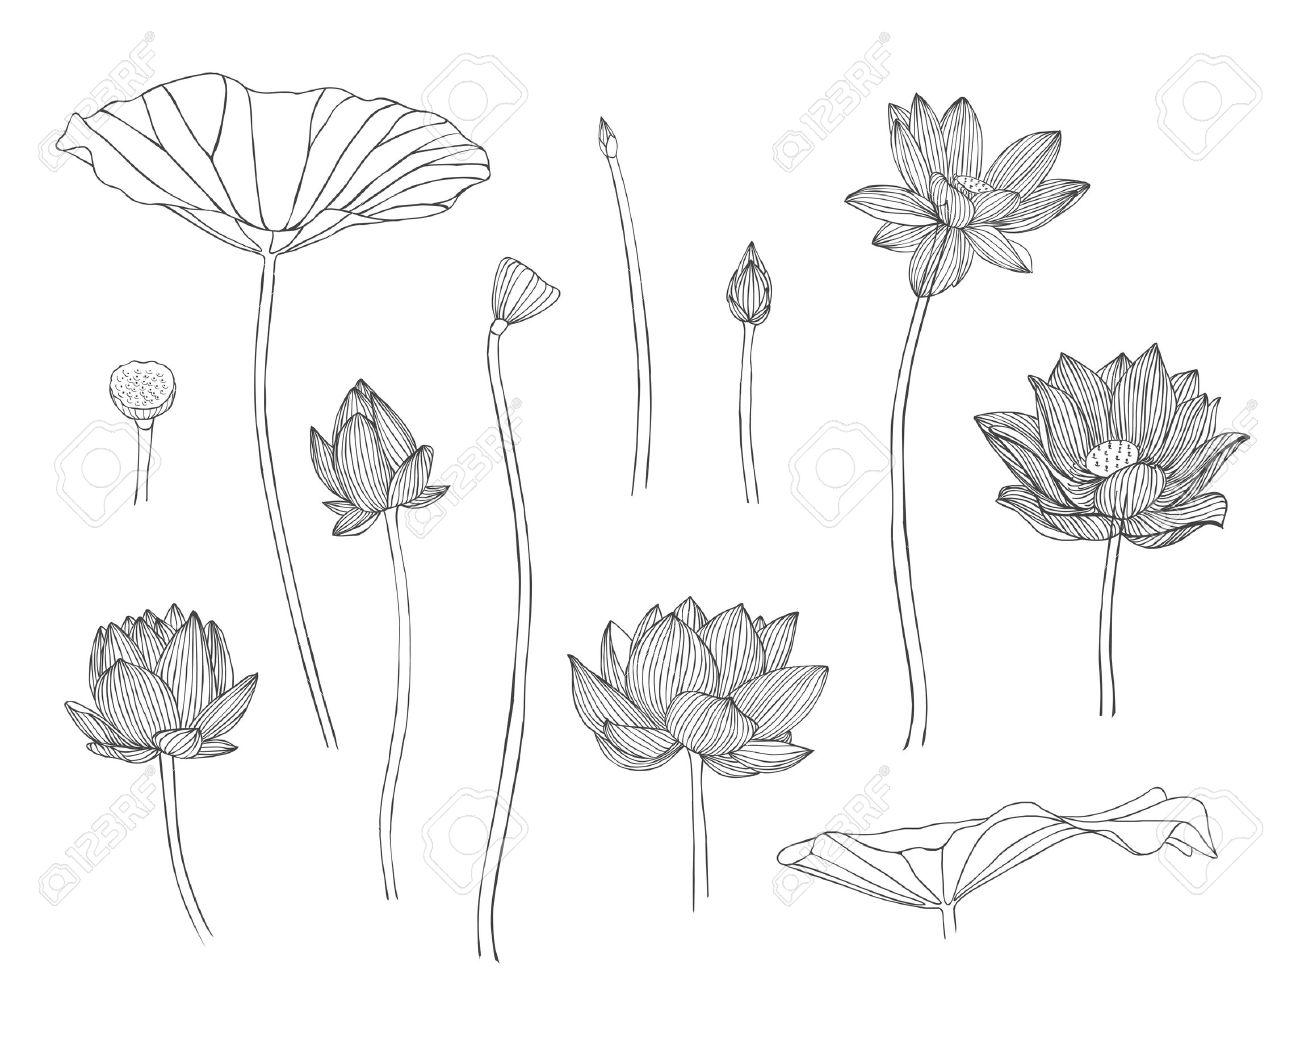 Engraving hand drawn illustration of lotus flower royalty free engraving hand drawn illustration of lotus flower stock vector 43470100 mightylinksfo